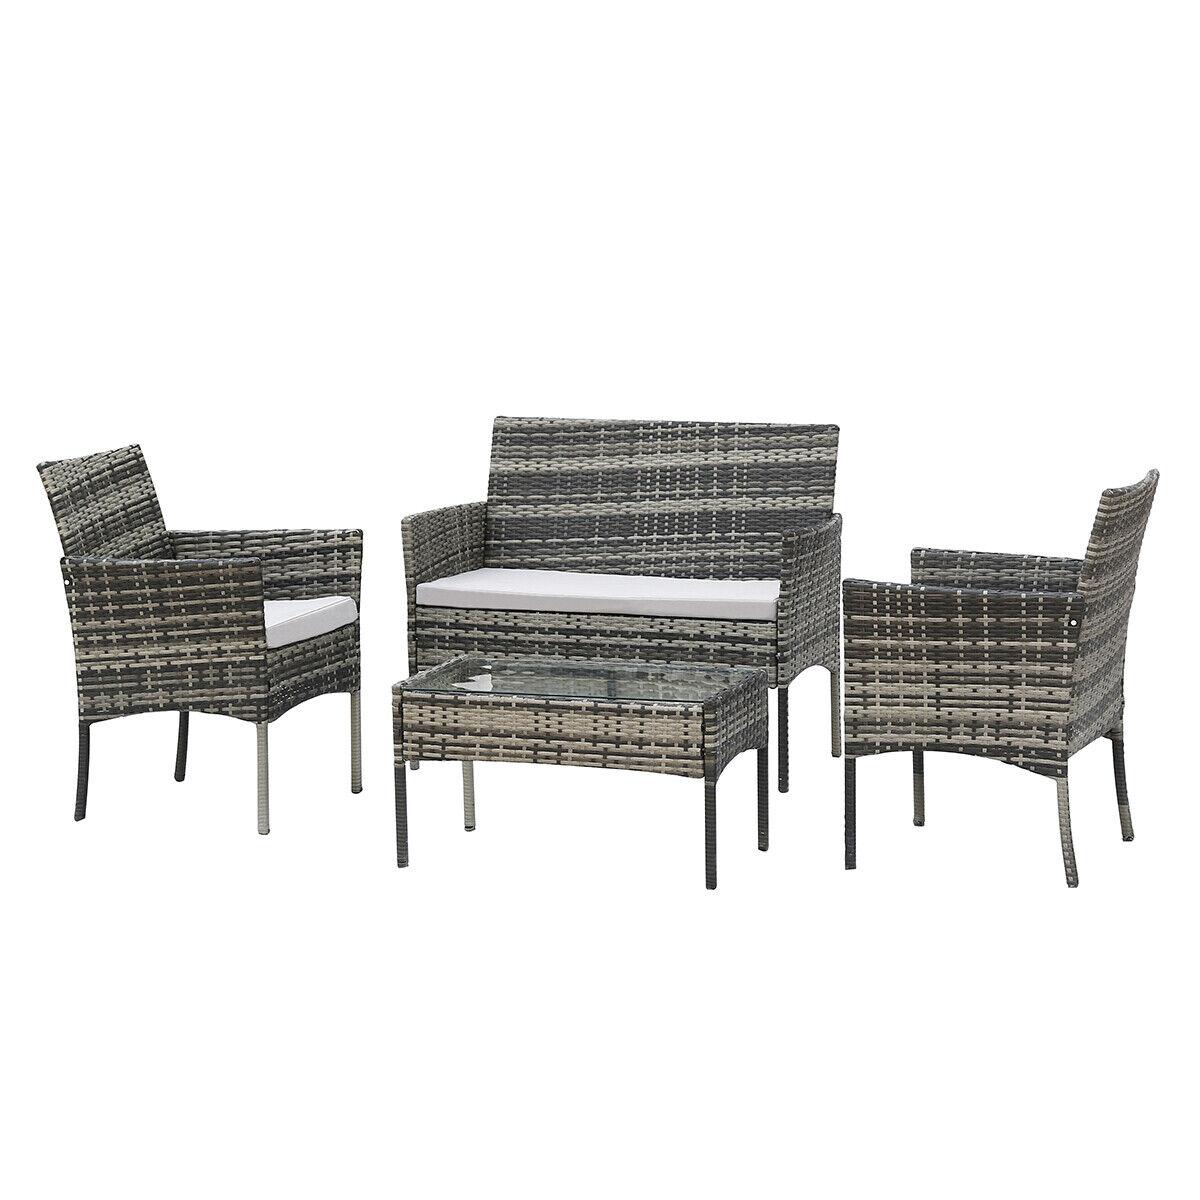 Garden Furniture - Grey Rattan Outdoor Garden Furniture Set 4 Piece Chairs Sofa Table Patio Set